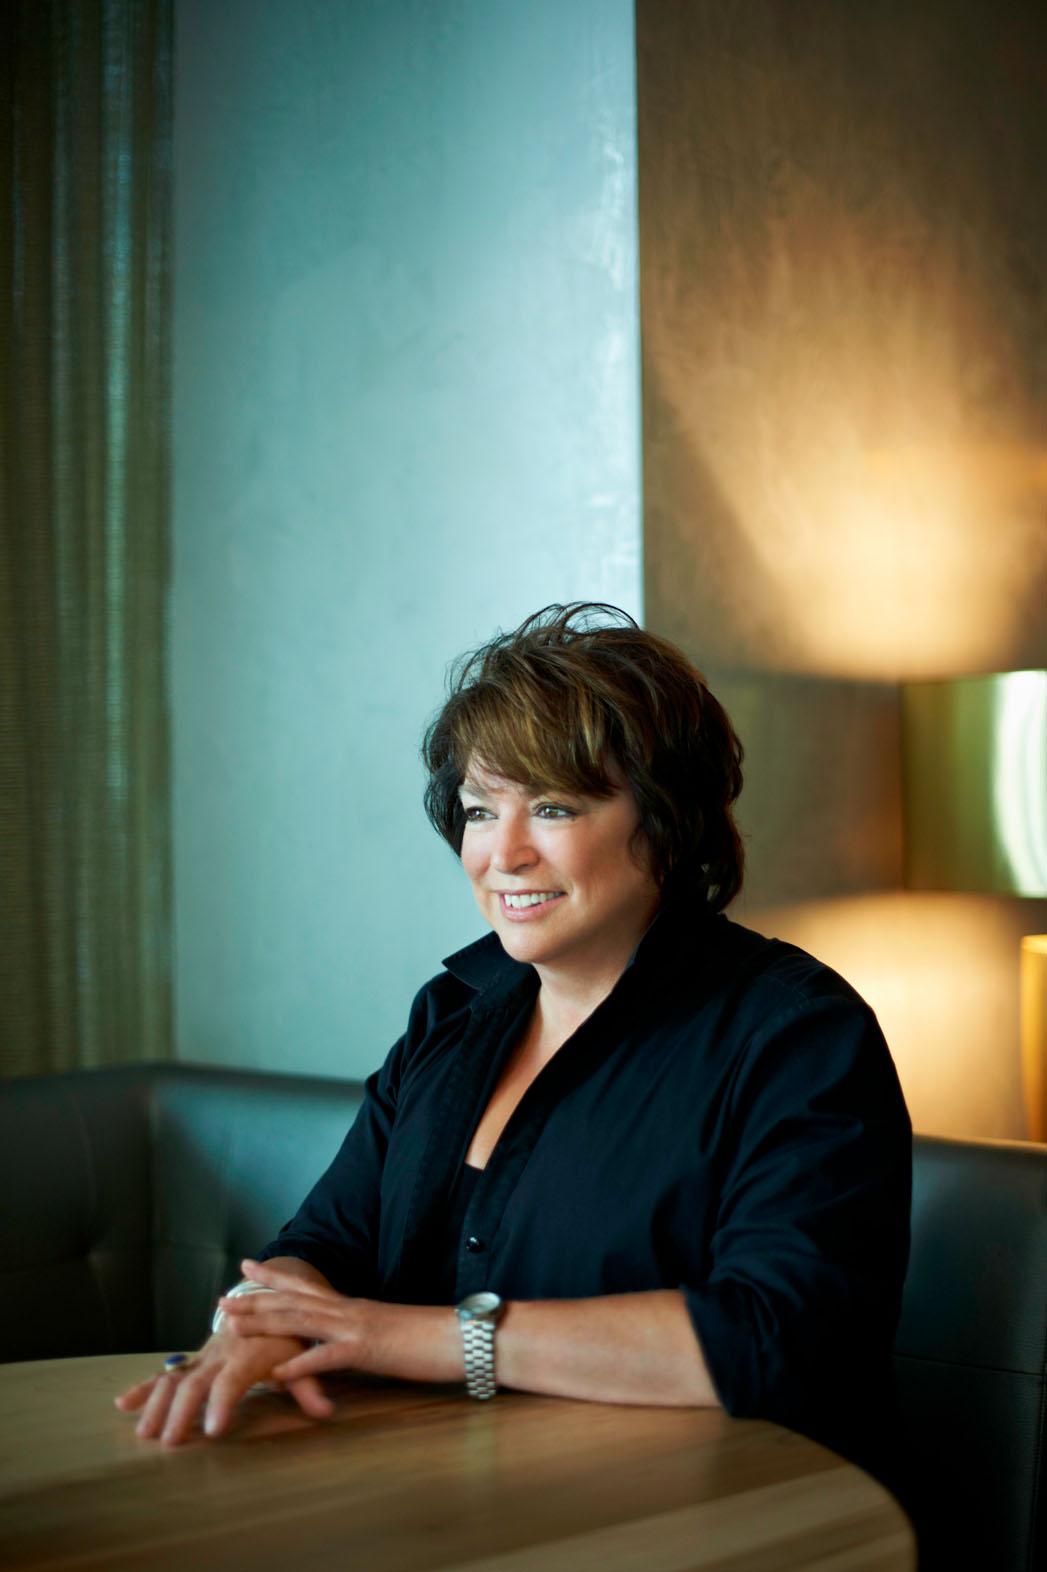 Susan Lacy Headshot - P 2013